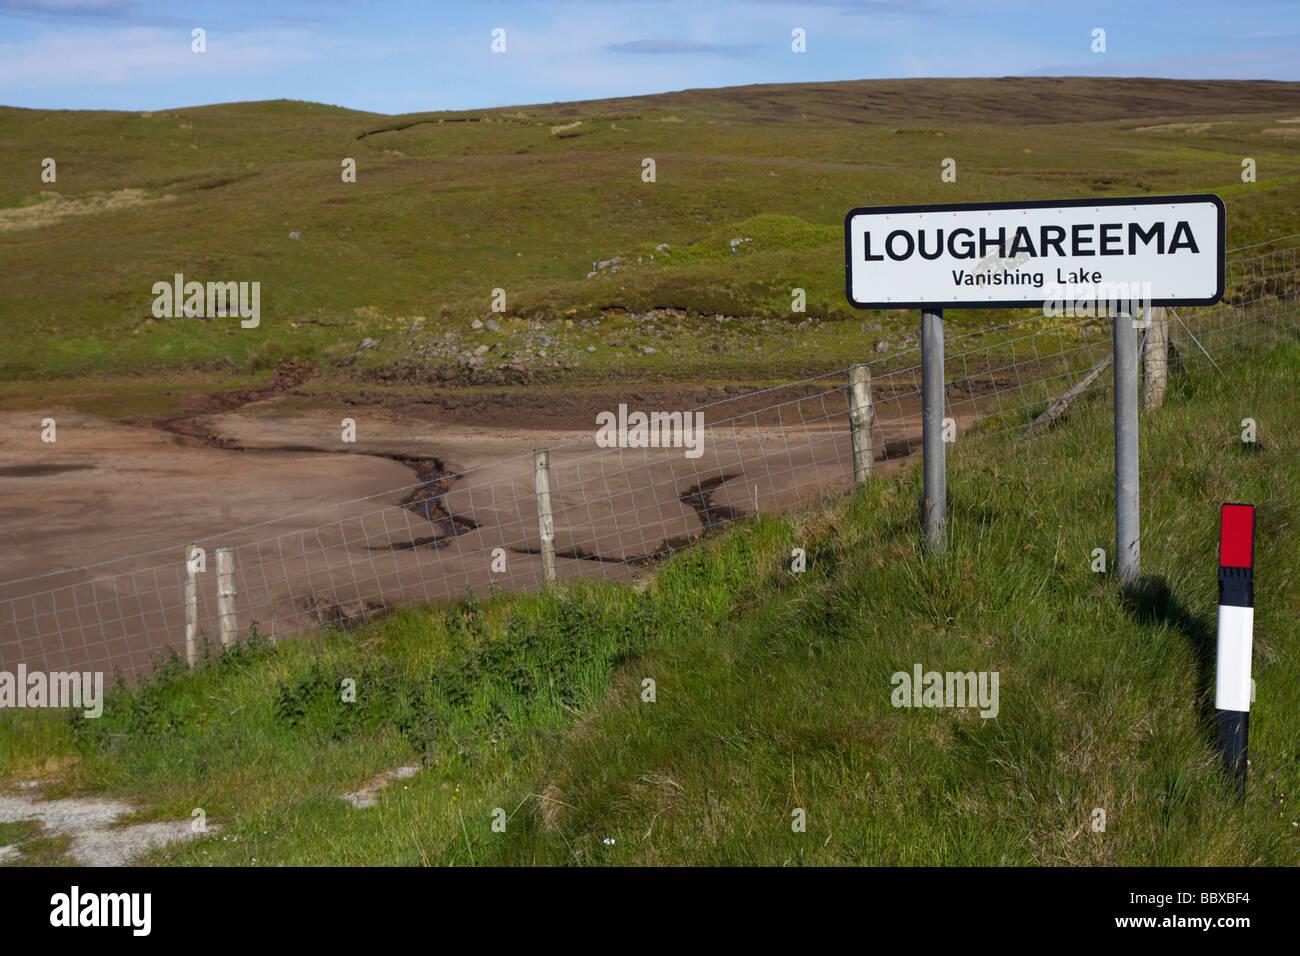 loughareema vanishing lake county antrim northern ireland uk The lake drains into a sinkhole - Stock Image